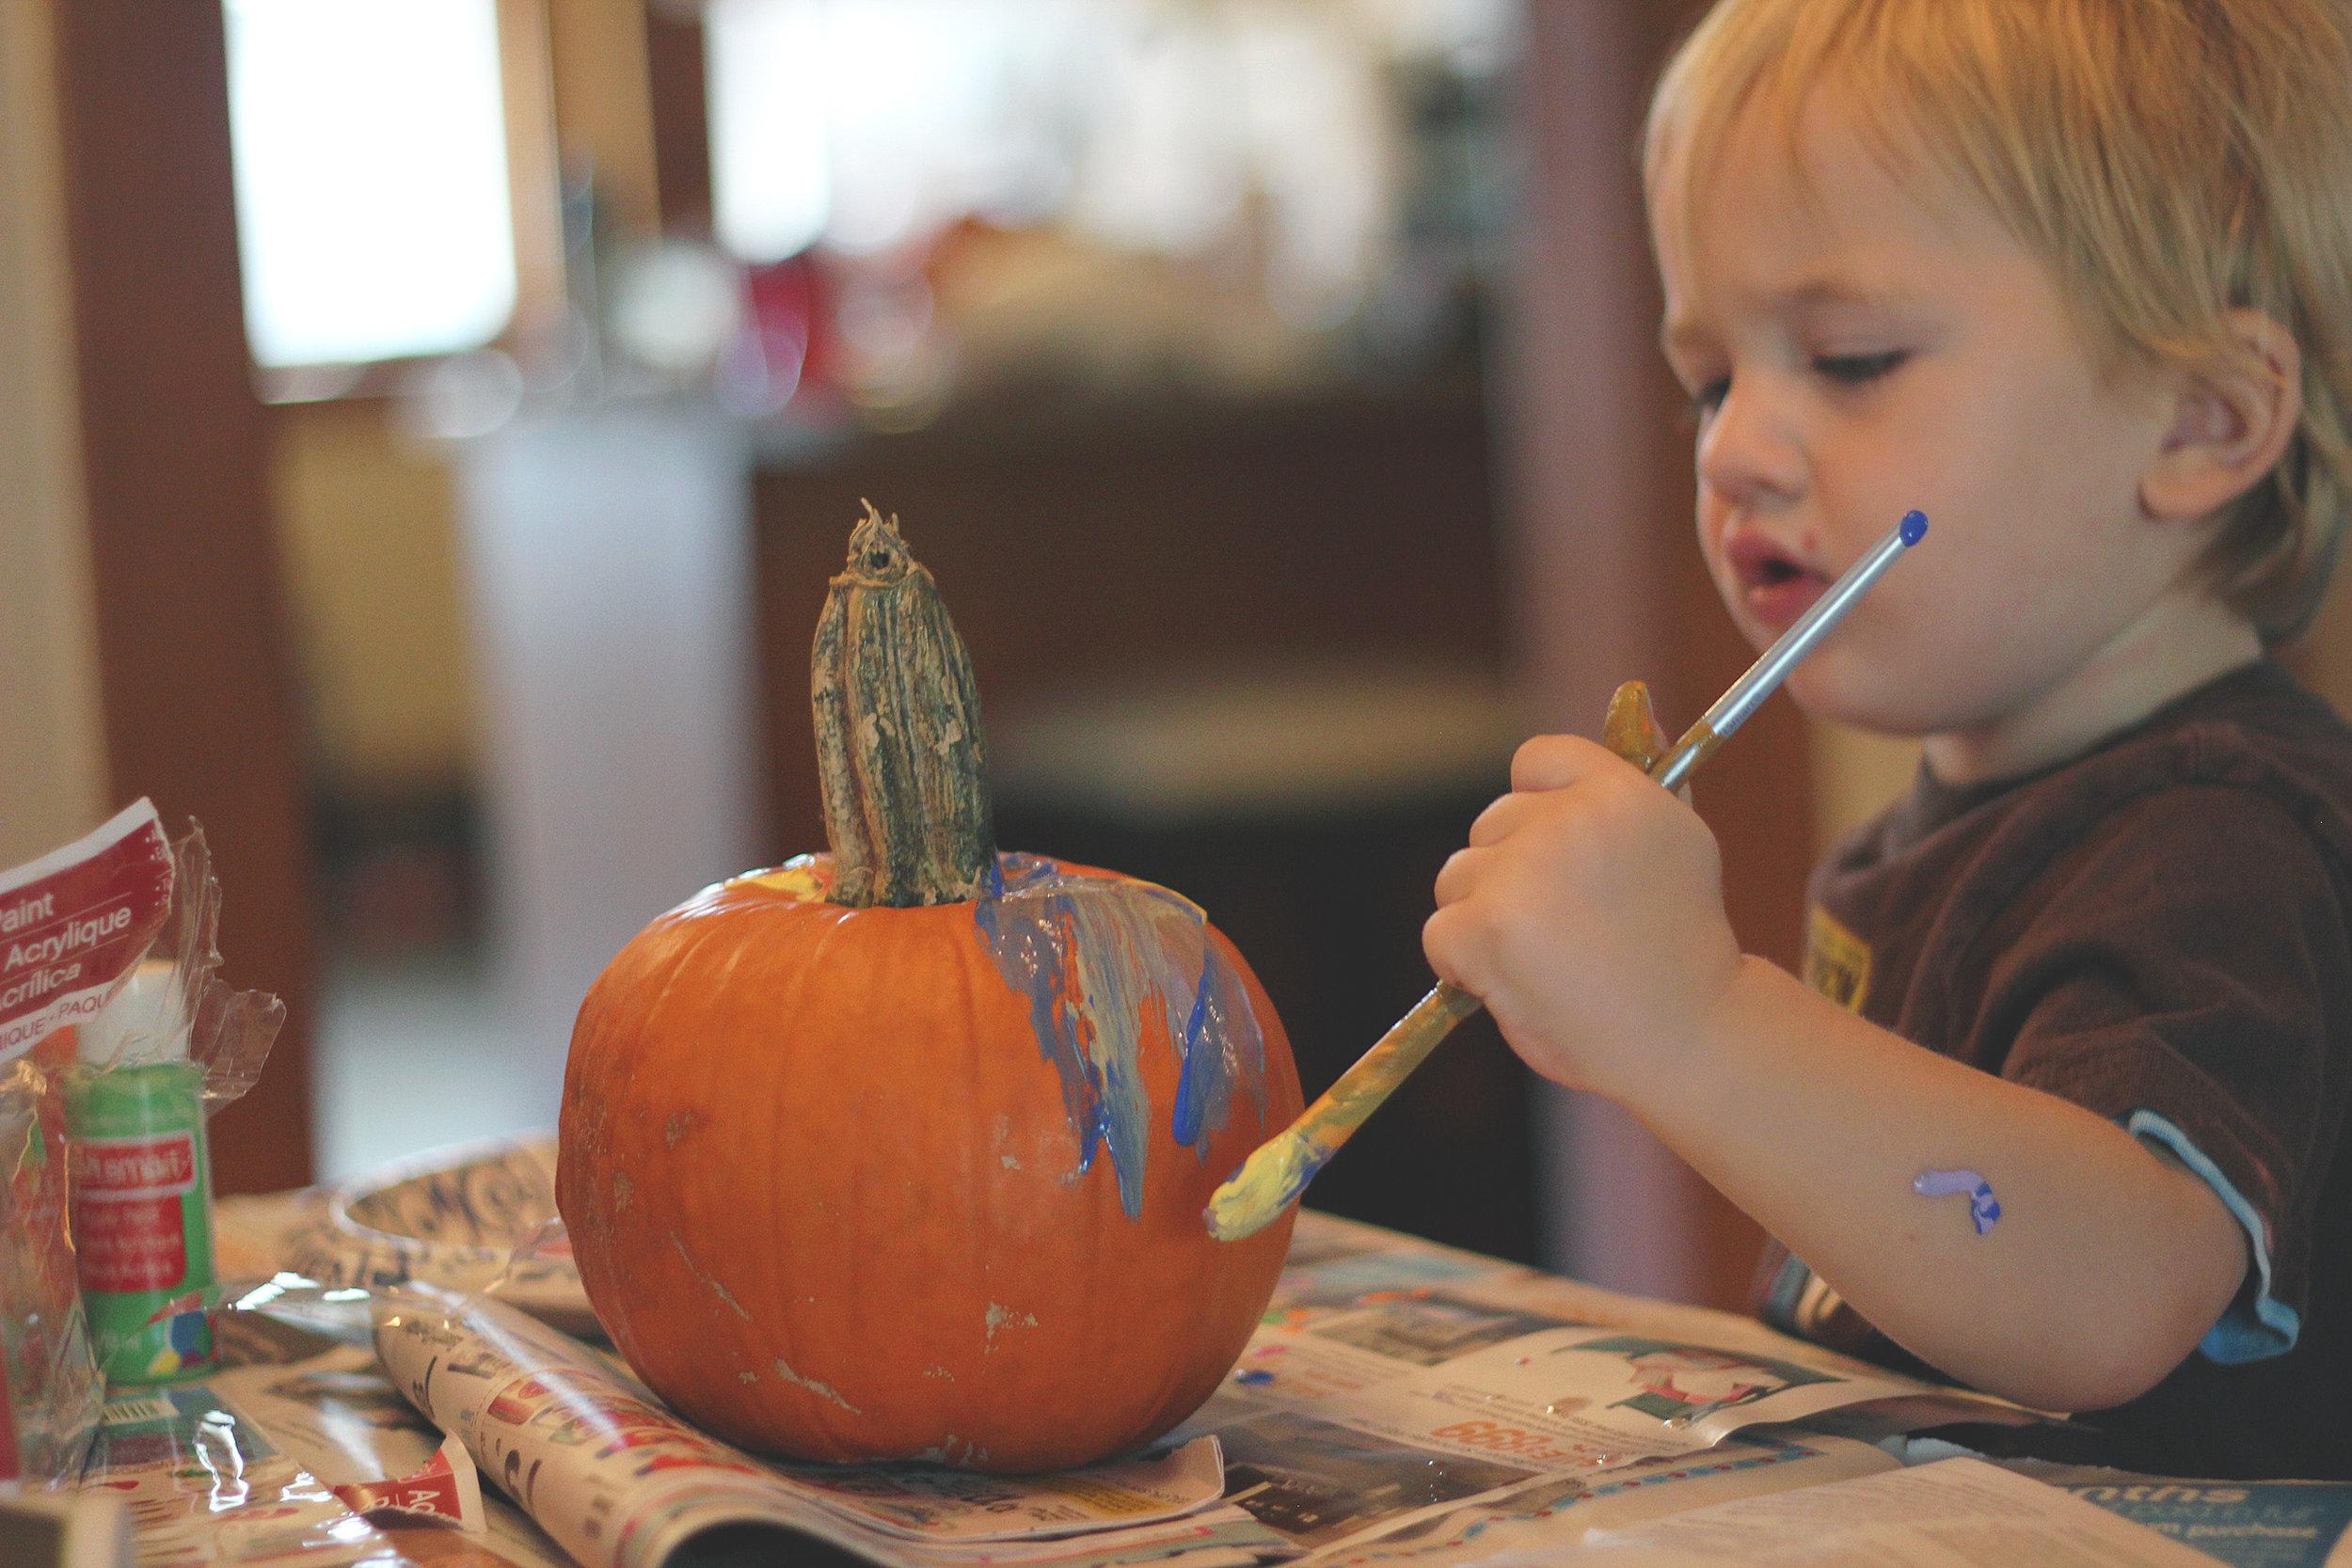 Painting pumpkins for Halloween